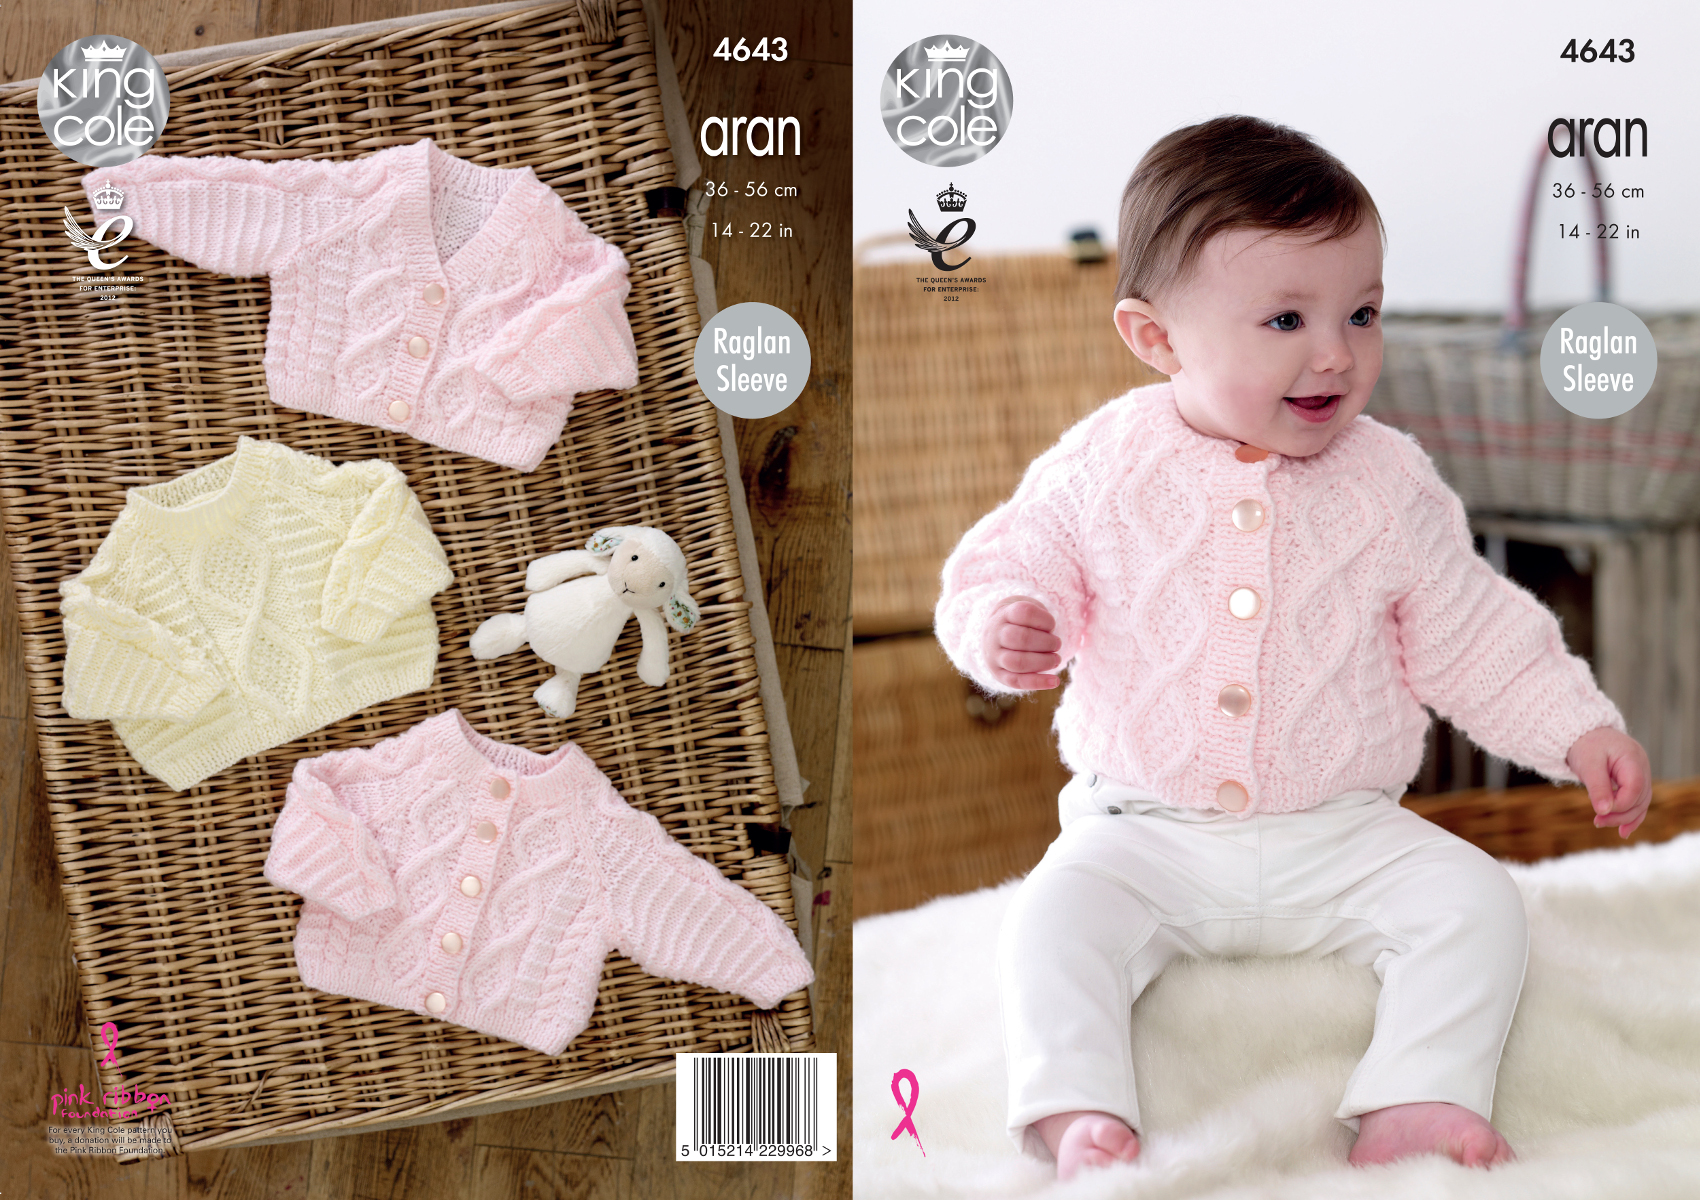 Knitting Pattern King Cole Baby Aran Raglan Sleeve Cabled Cardigans ...